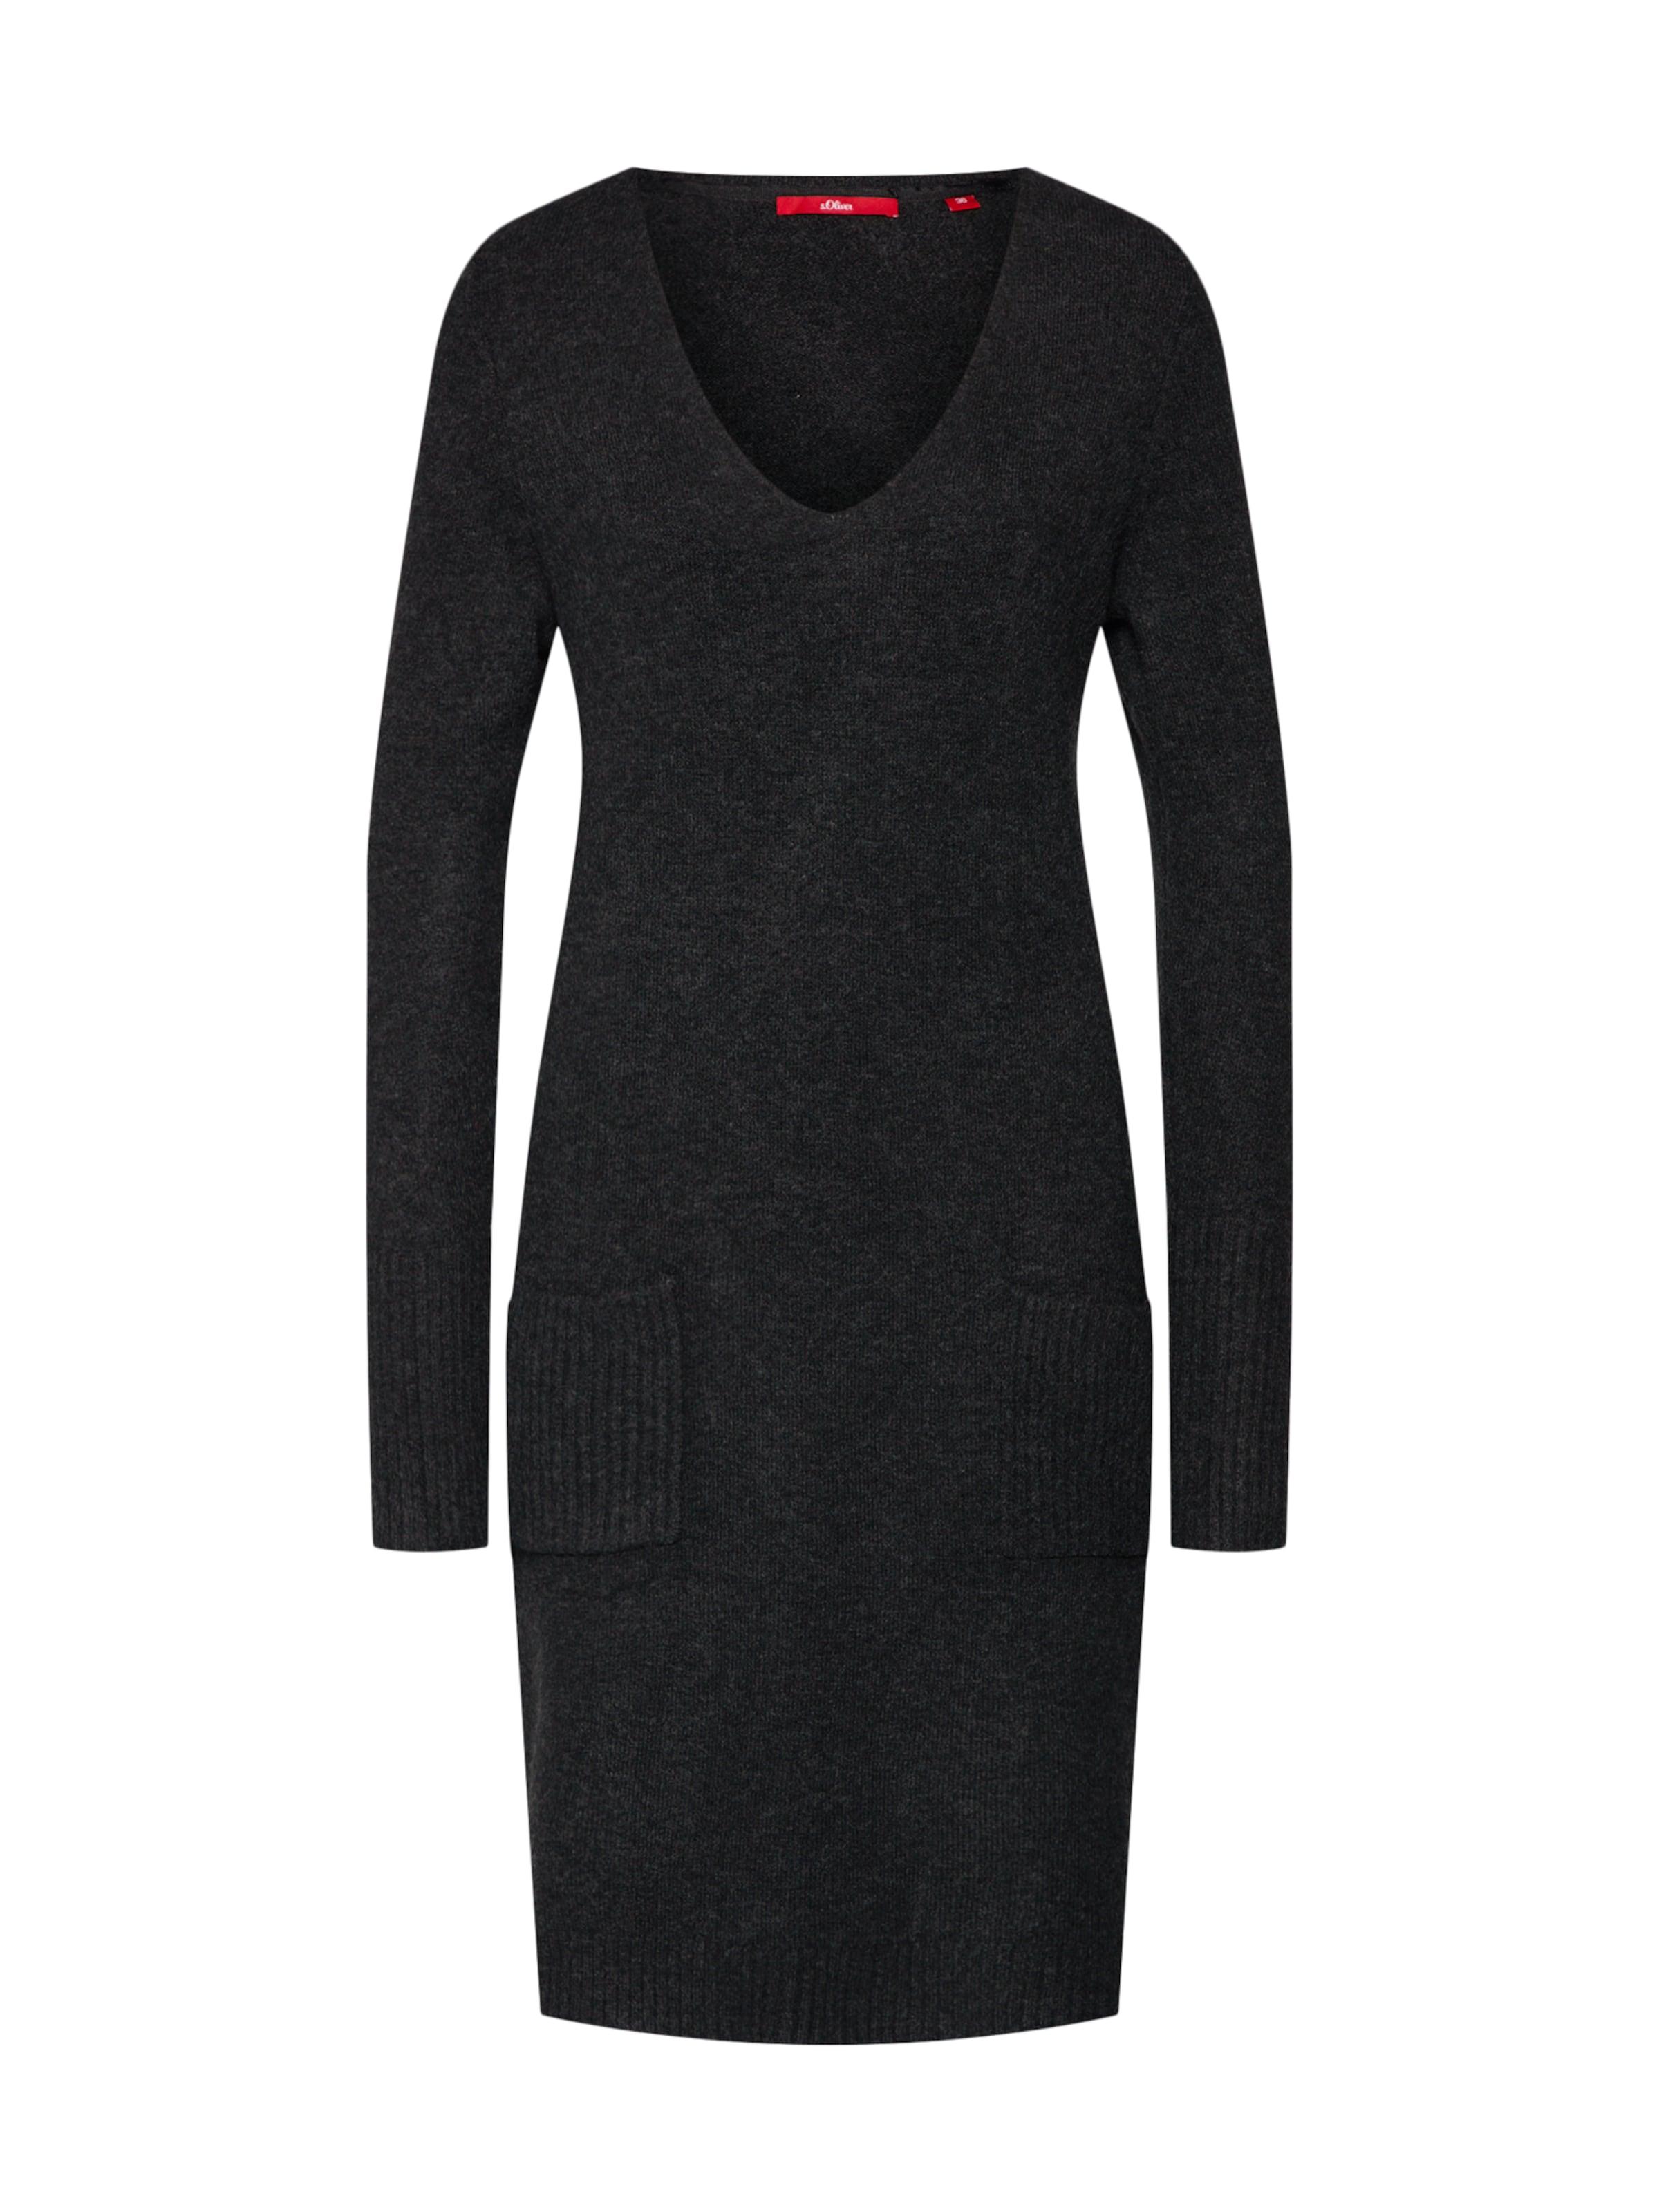 S S S In Kleid Schwarz Schwarz oliver oliver In Kleid nON0v8mw